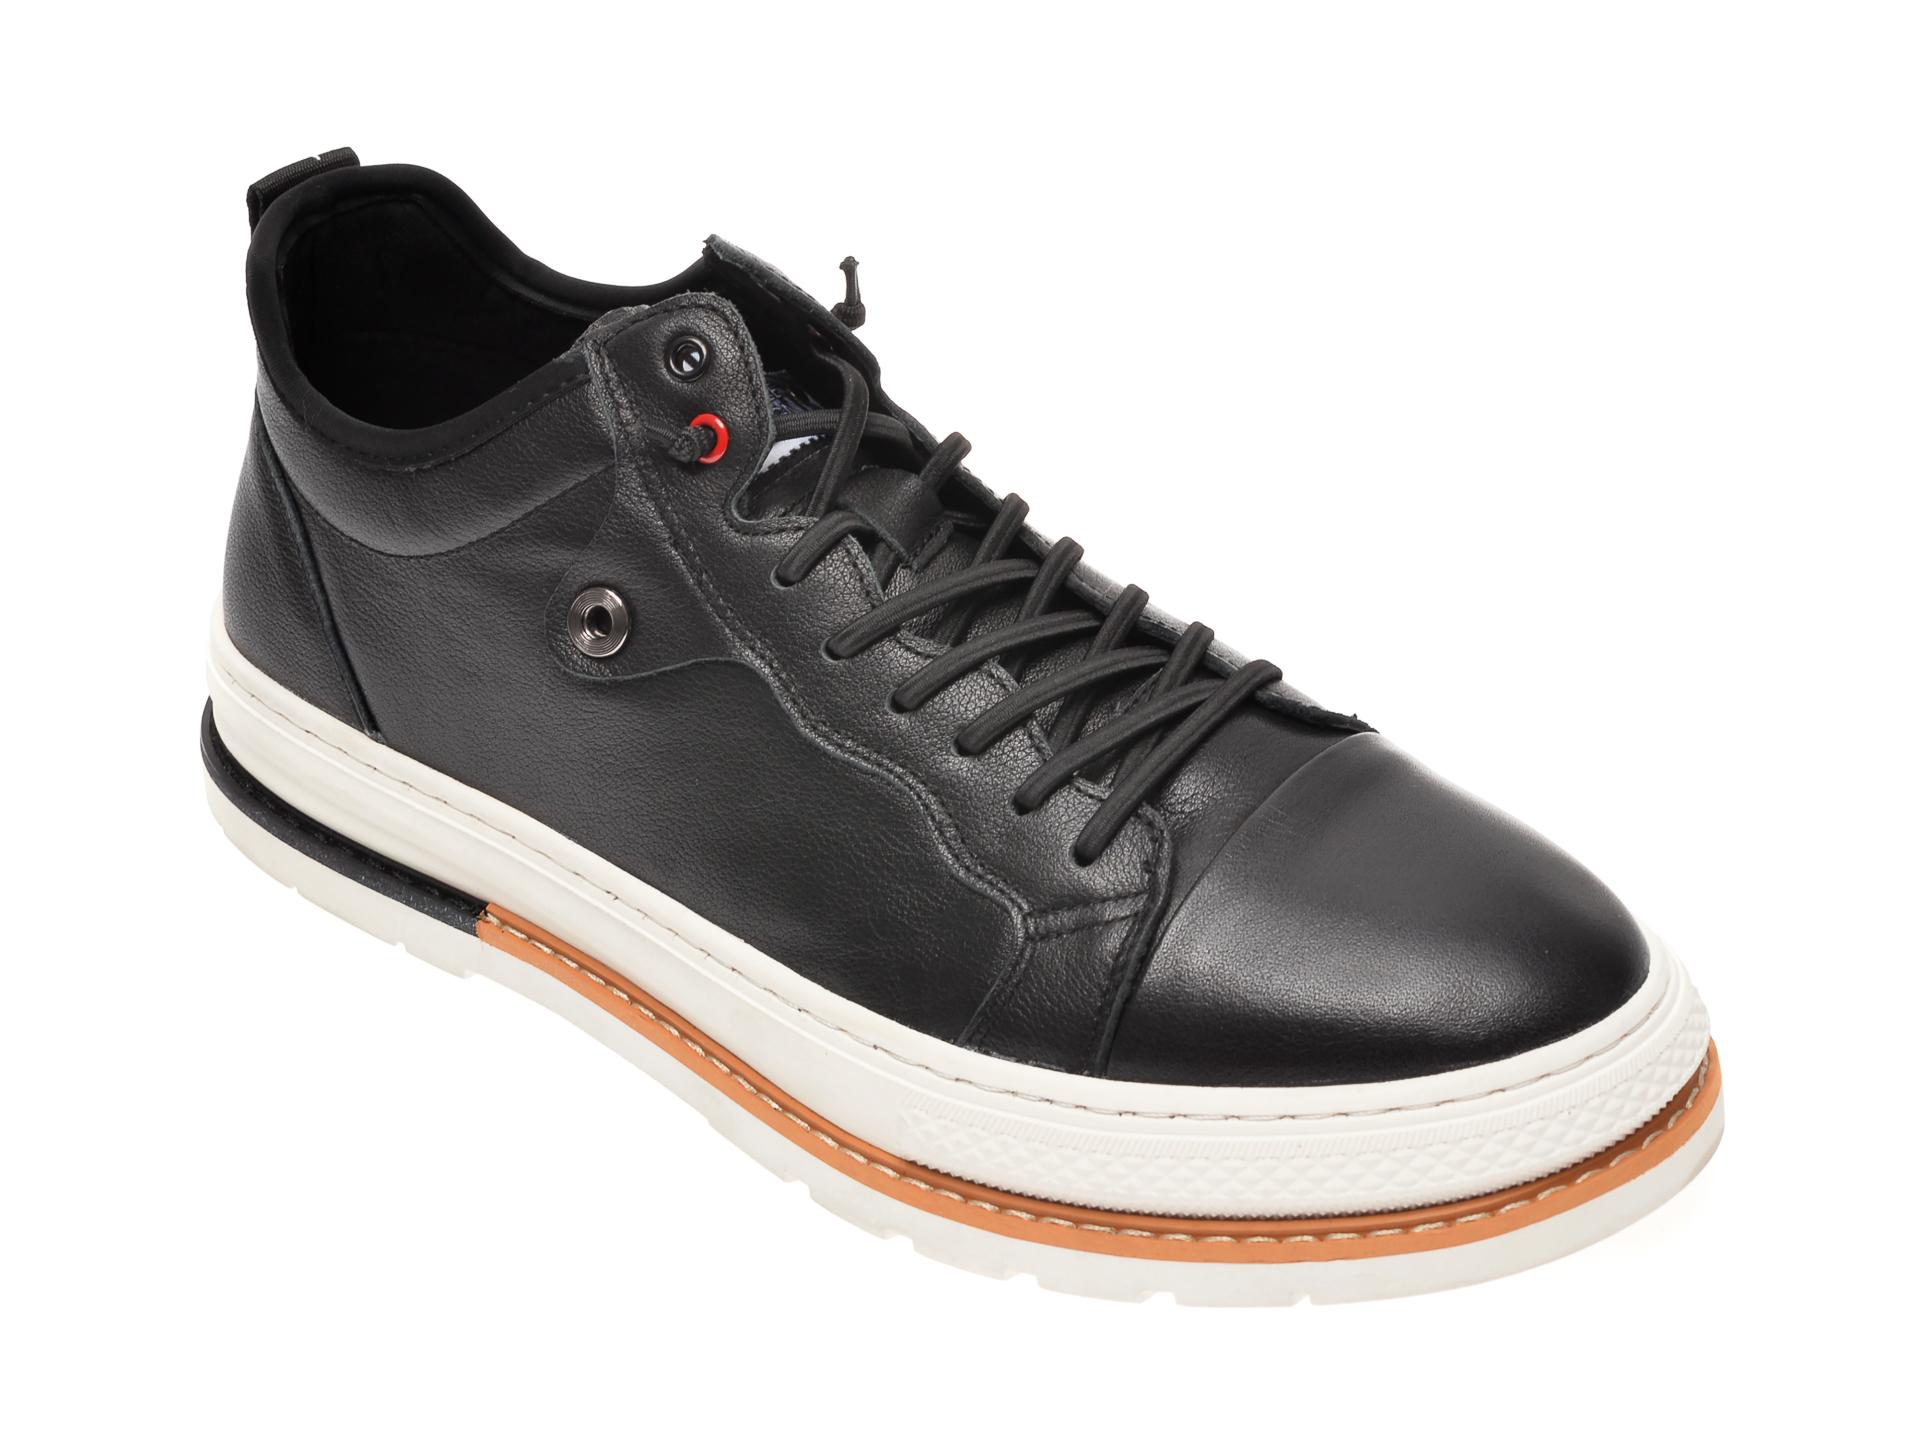 Pantofi BITE THE BULLET negri, 938323, din piele naturala imagine